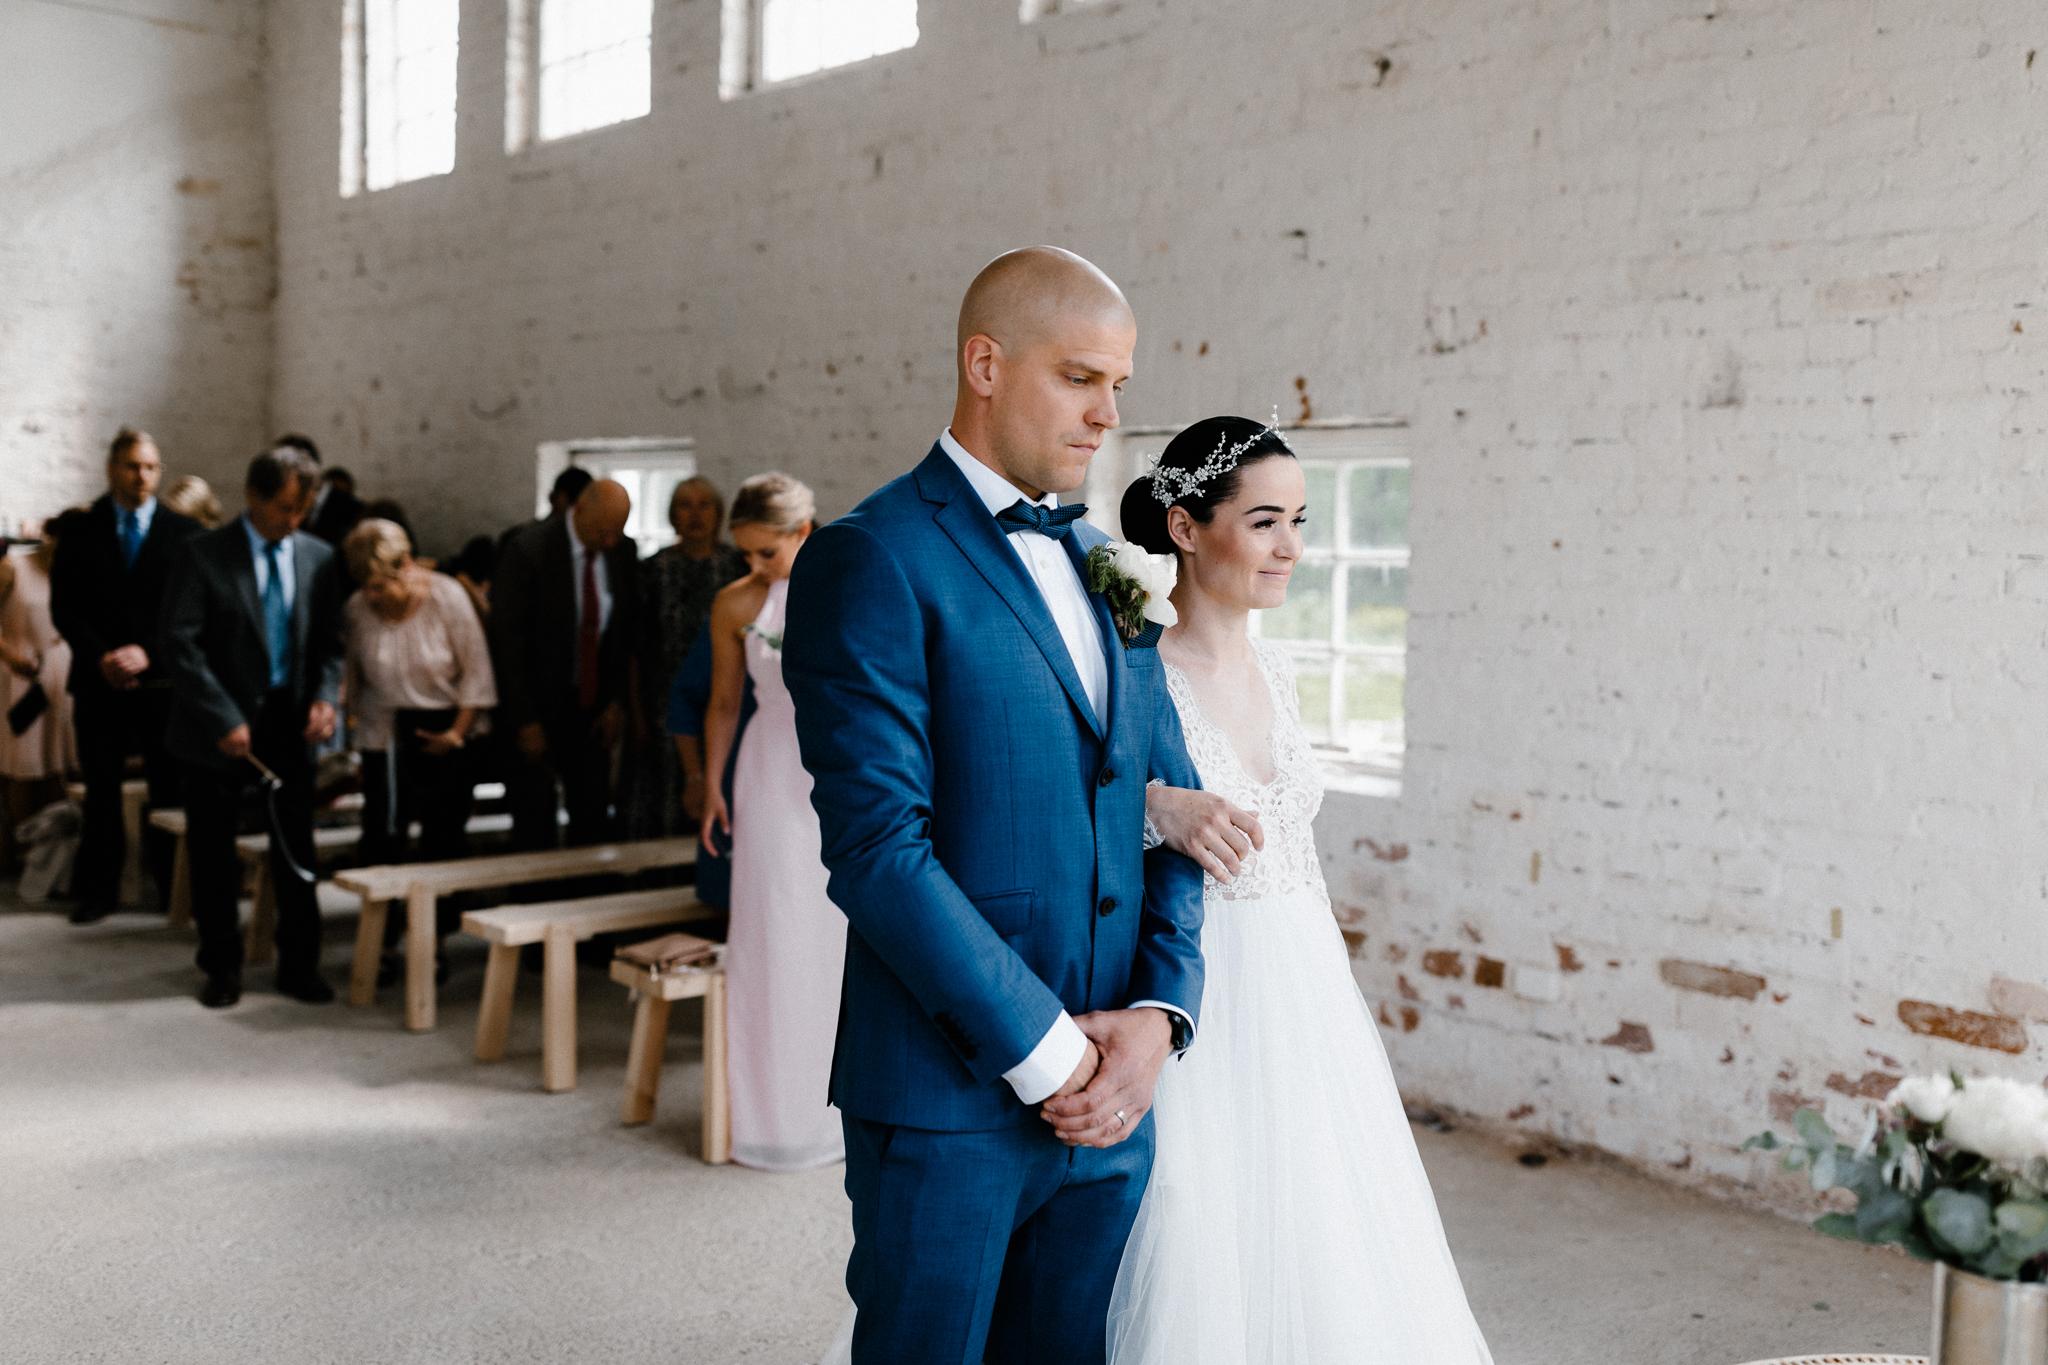 Essi + Ville | Oitbacka Gården | by Patrick Karkkolainen Wedding Photography-151.jpg